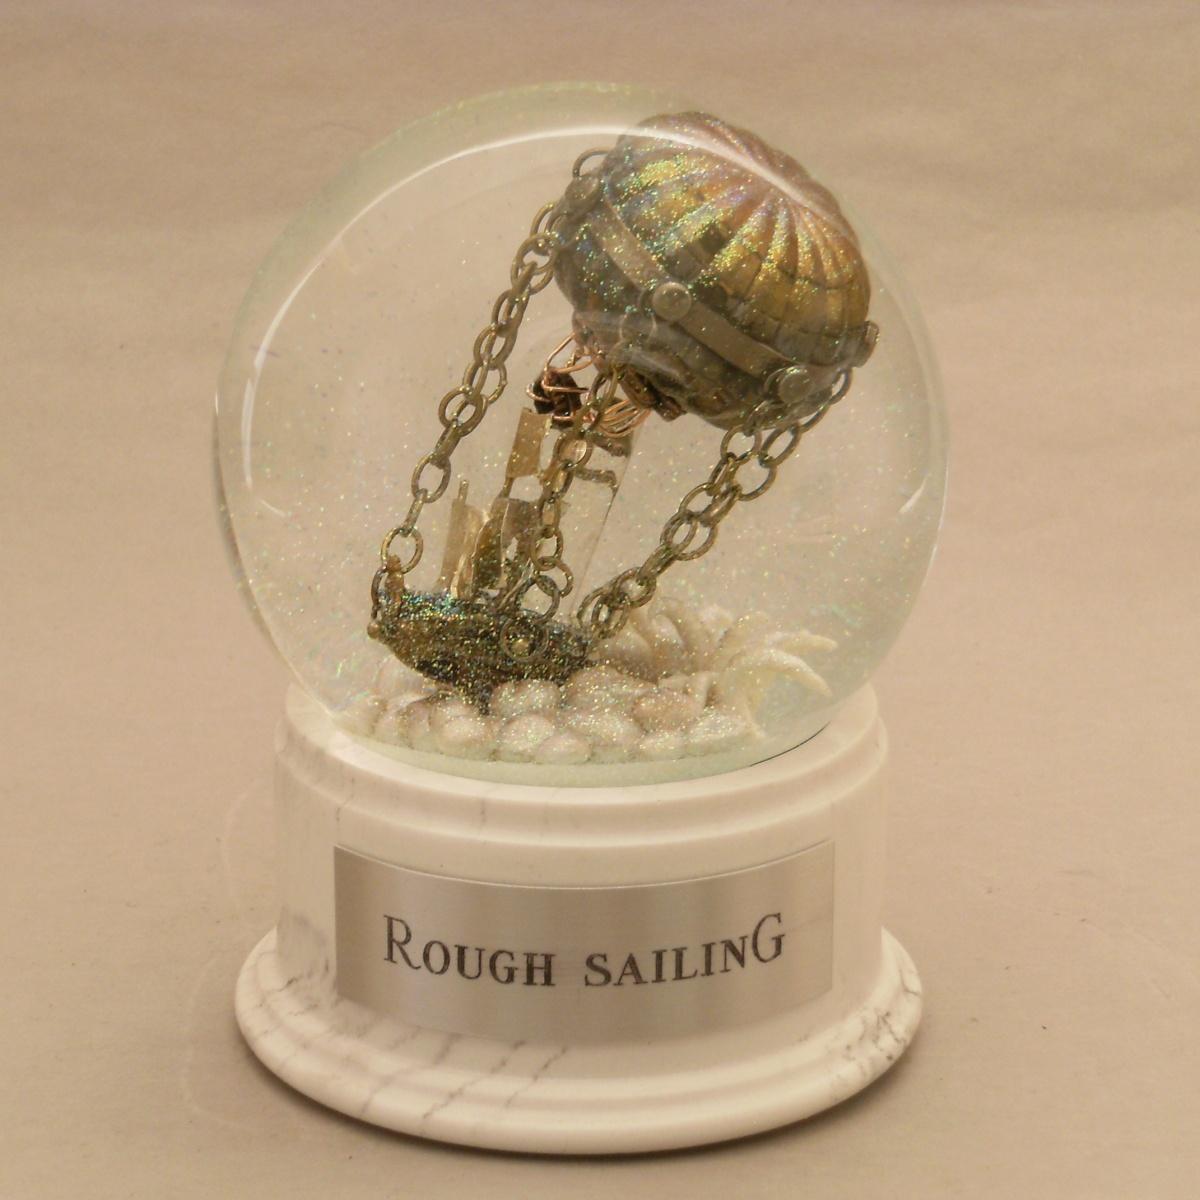 Rough Sailing snow globe by Camryn Forrest Designs